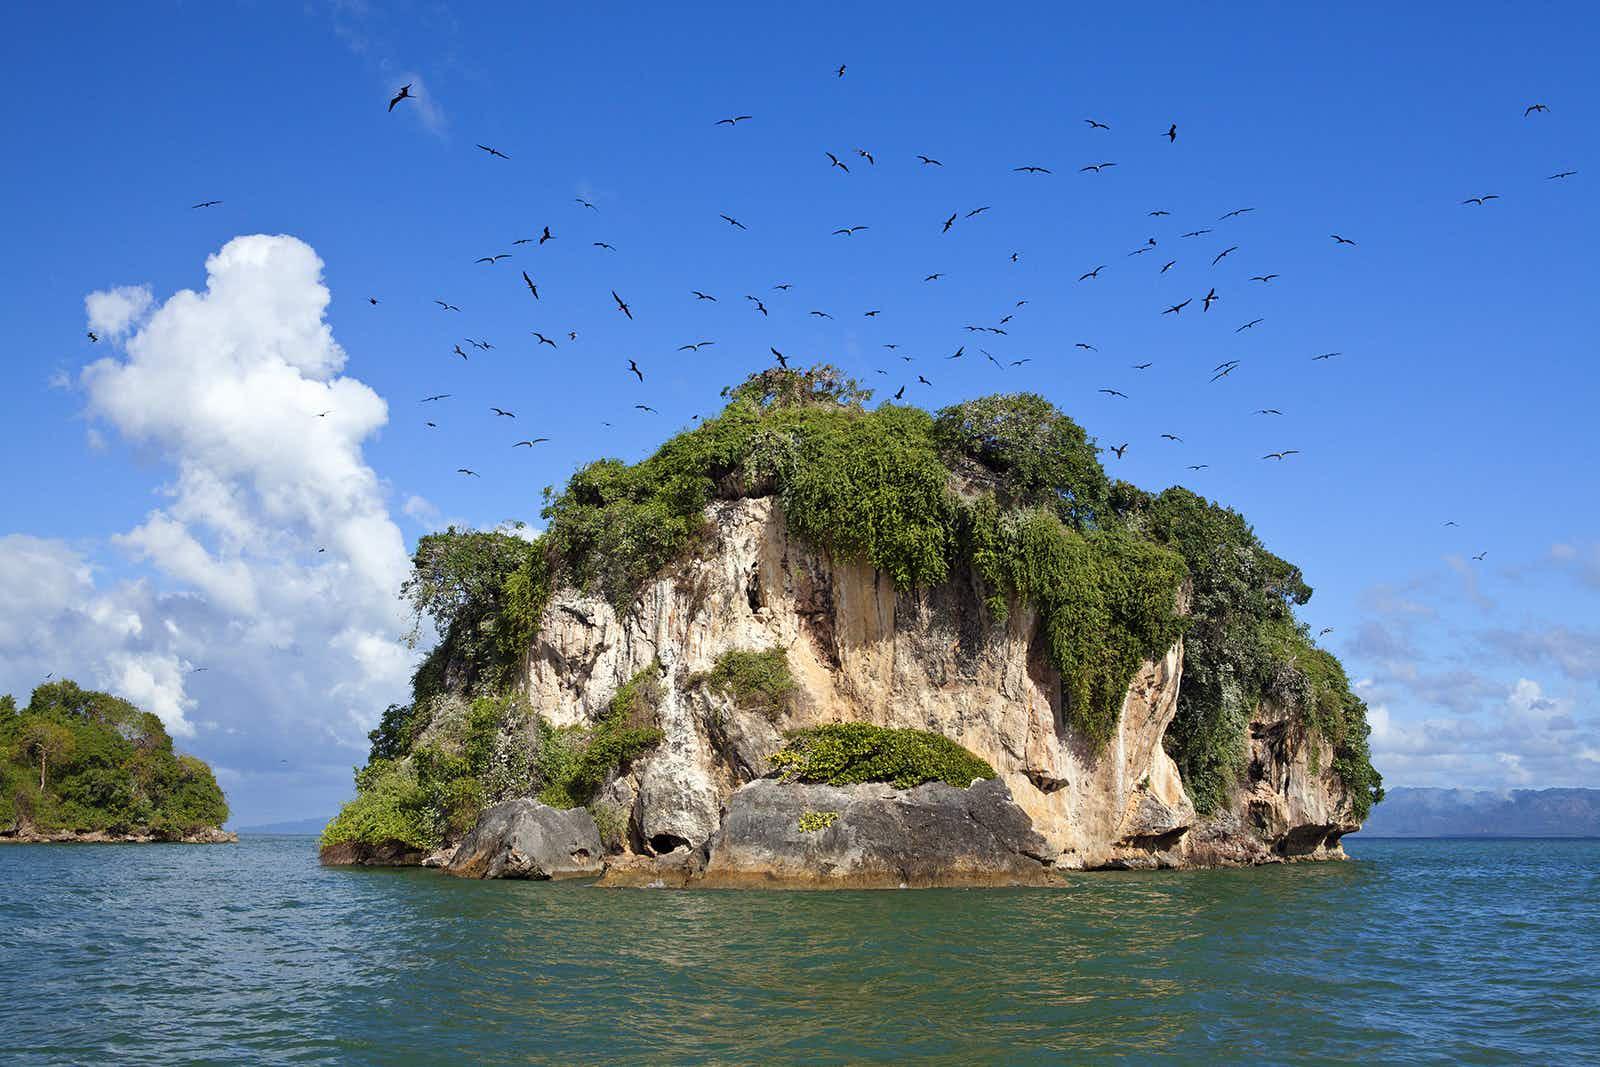 Bird Island in Los Haitises National Park © Daniela Dirscherl / Lonely Planet